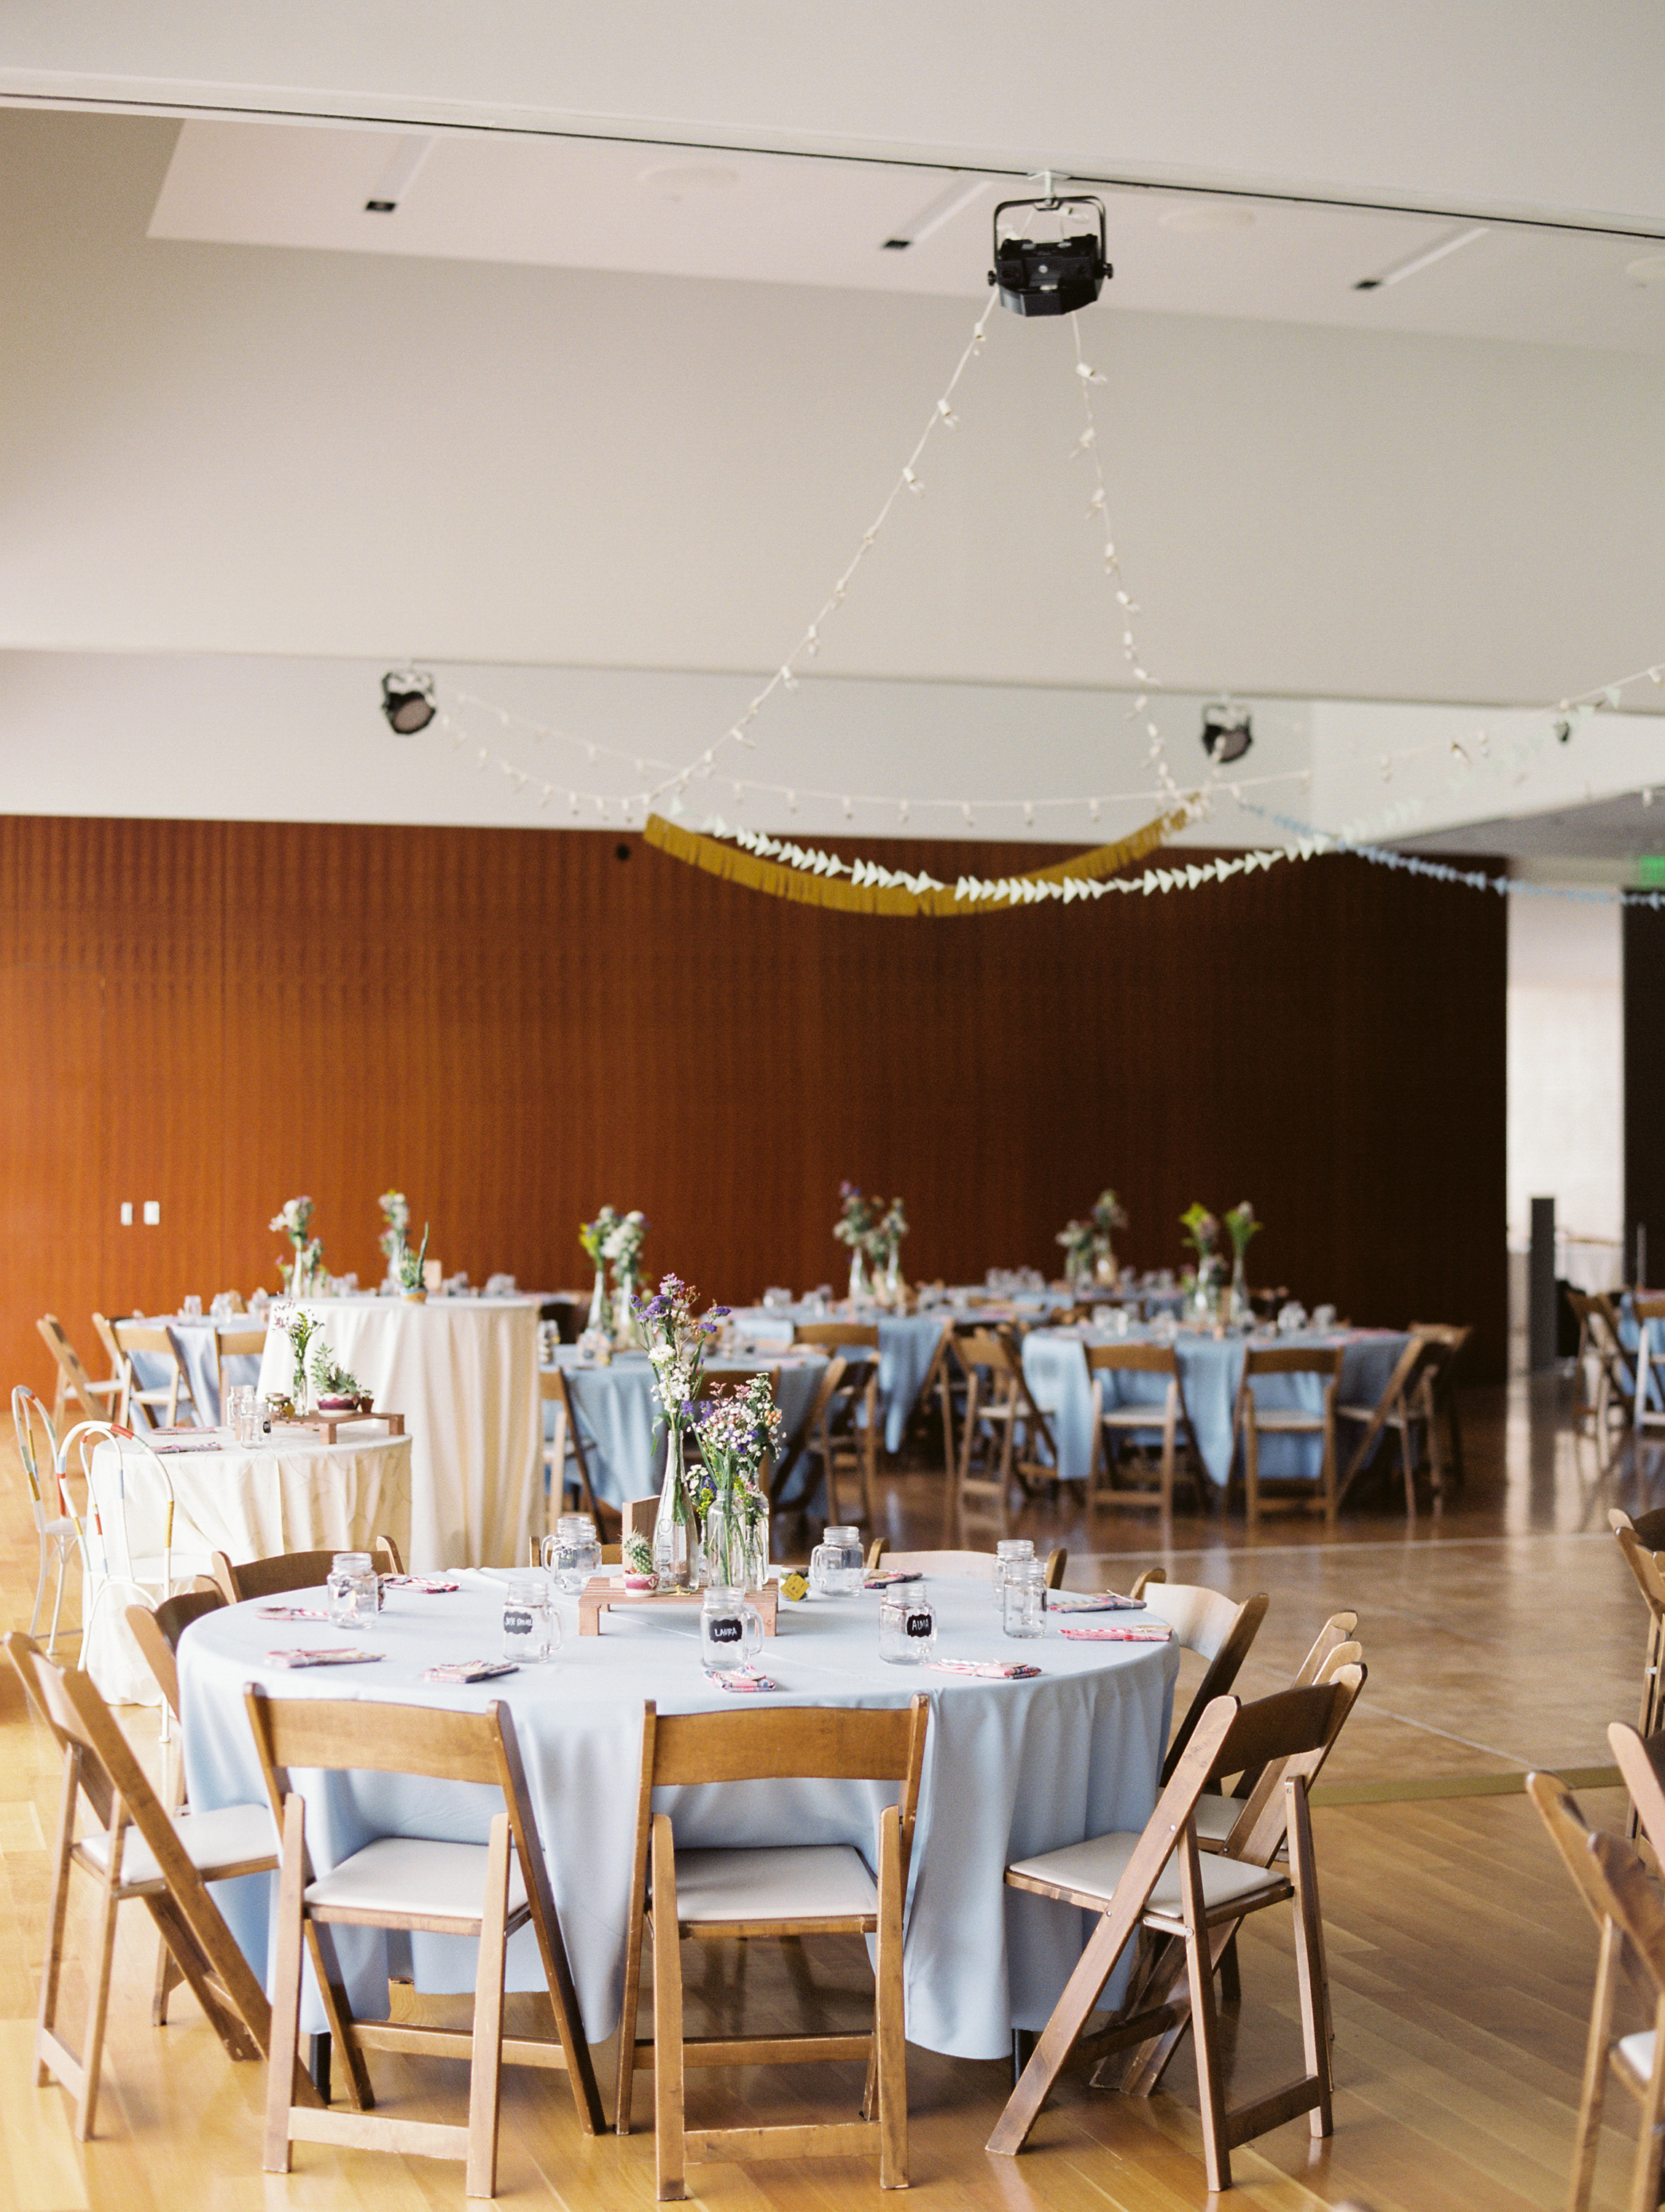 Dana-Fernandez-Photography-Martha-Stewart-Weddings-Houston-Texas-Wedding-Photographer-Film-30.jpg